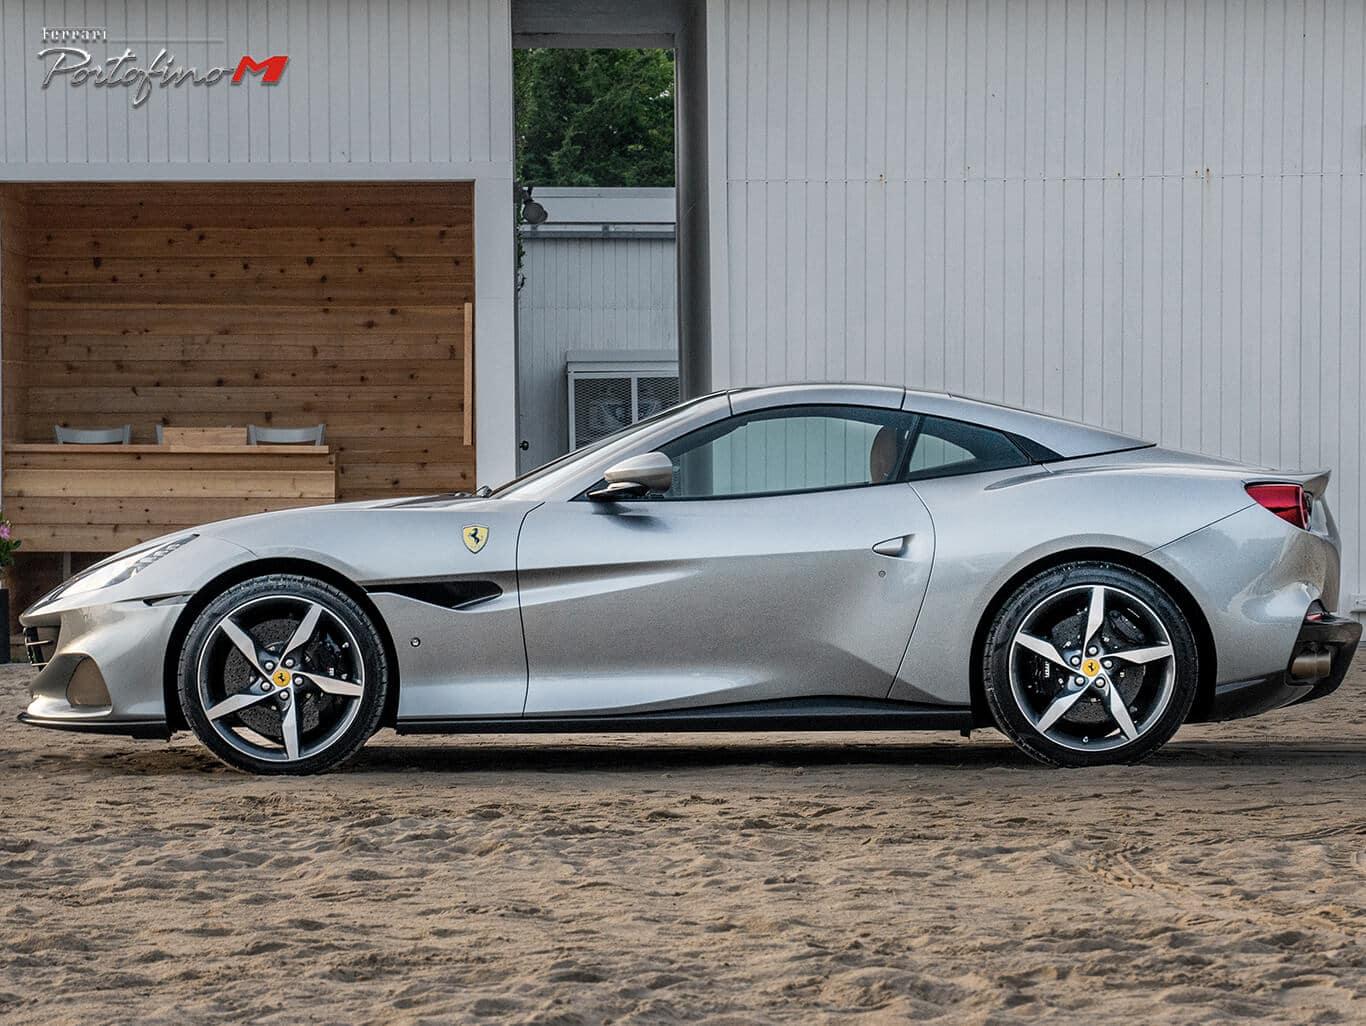 Ferrari Portofino M   Ferrari of Long Island